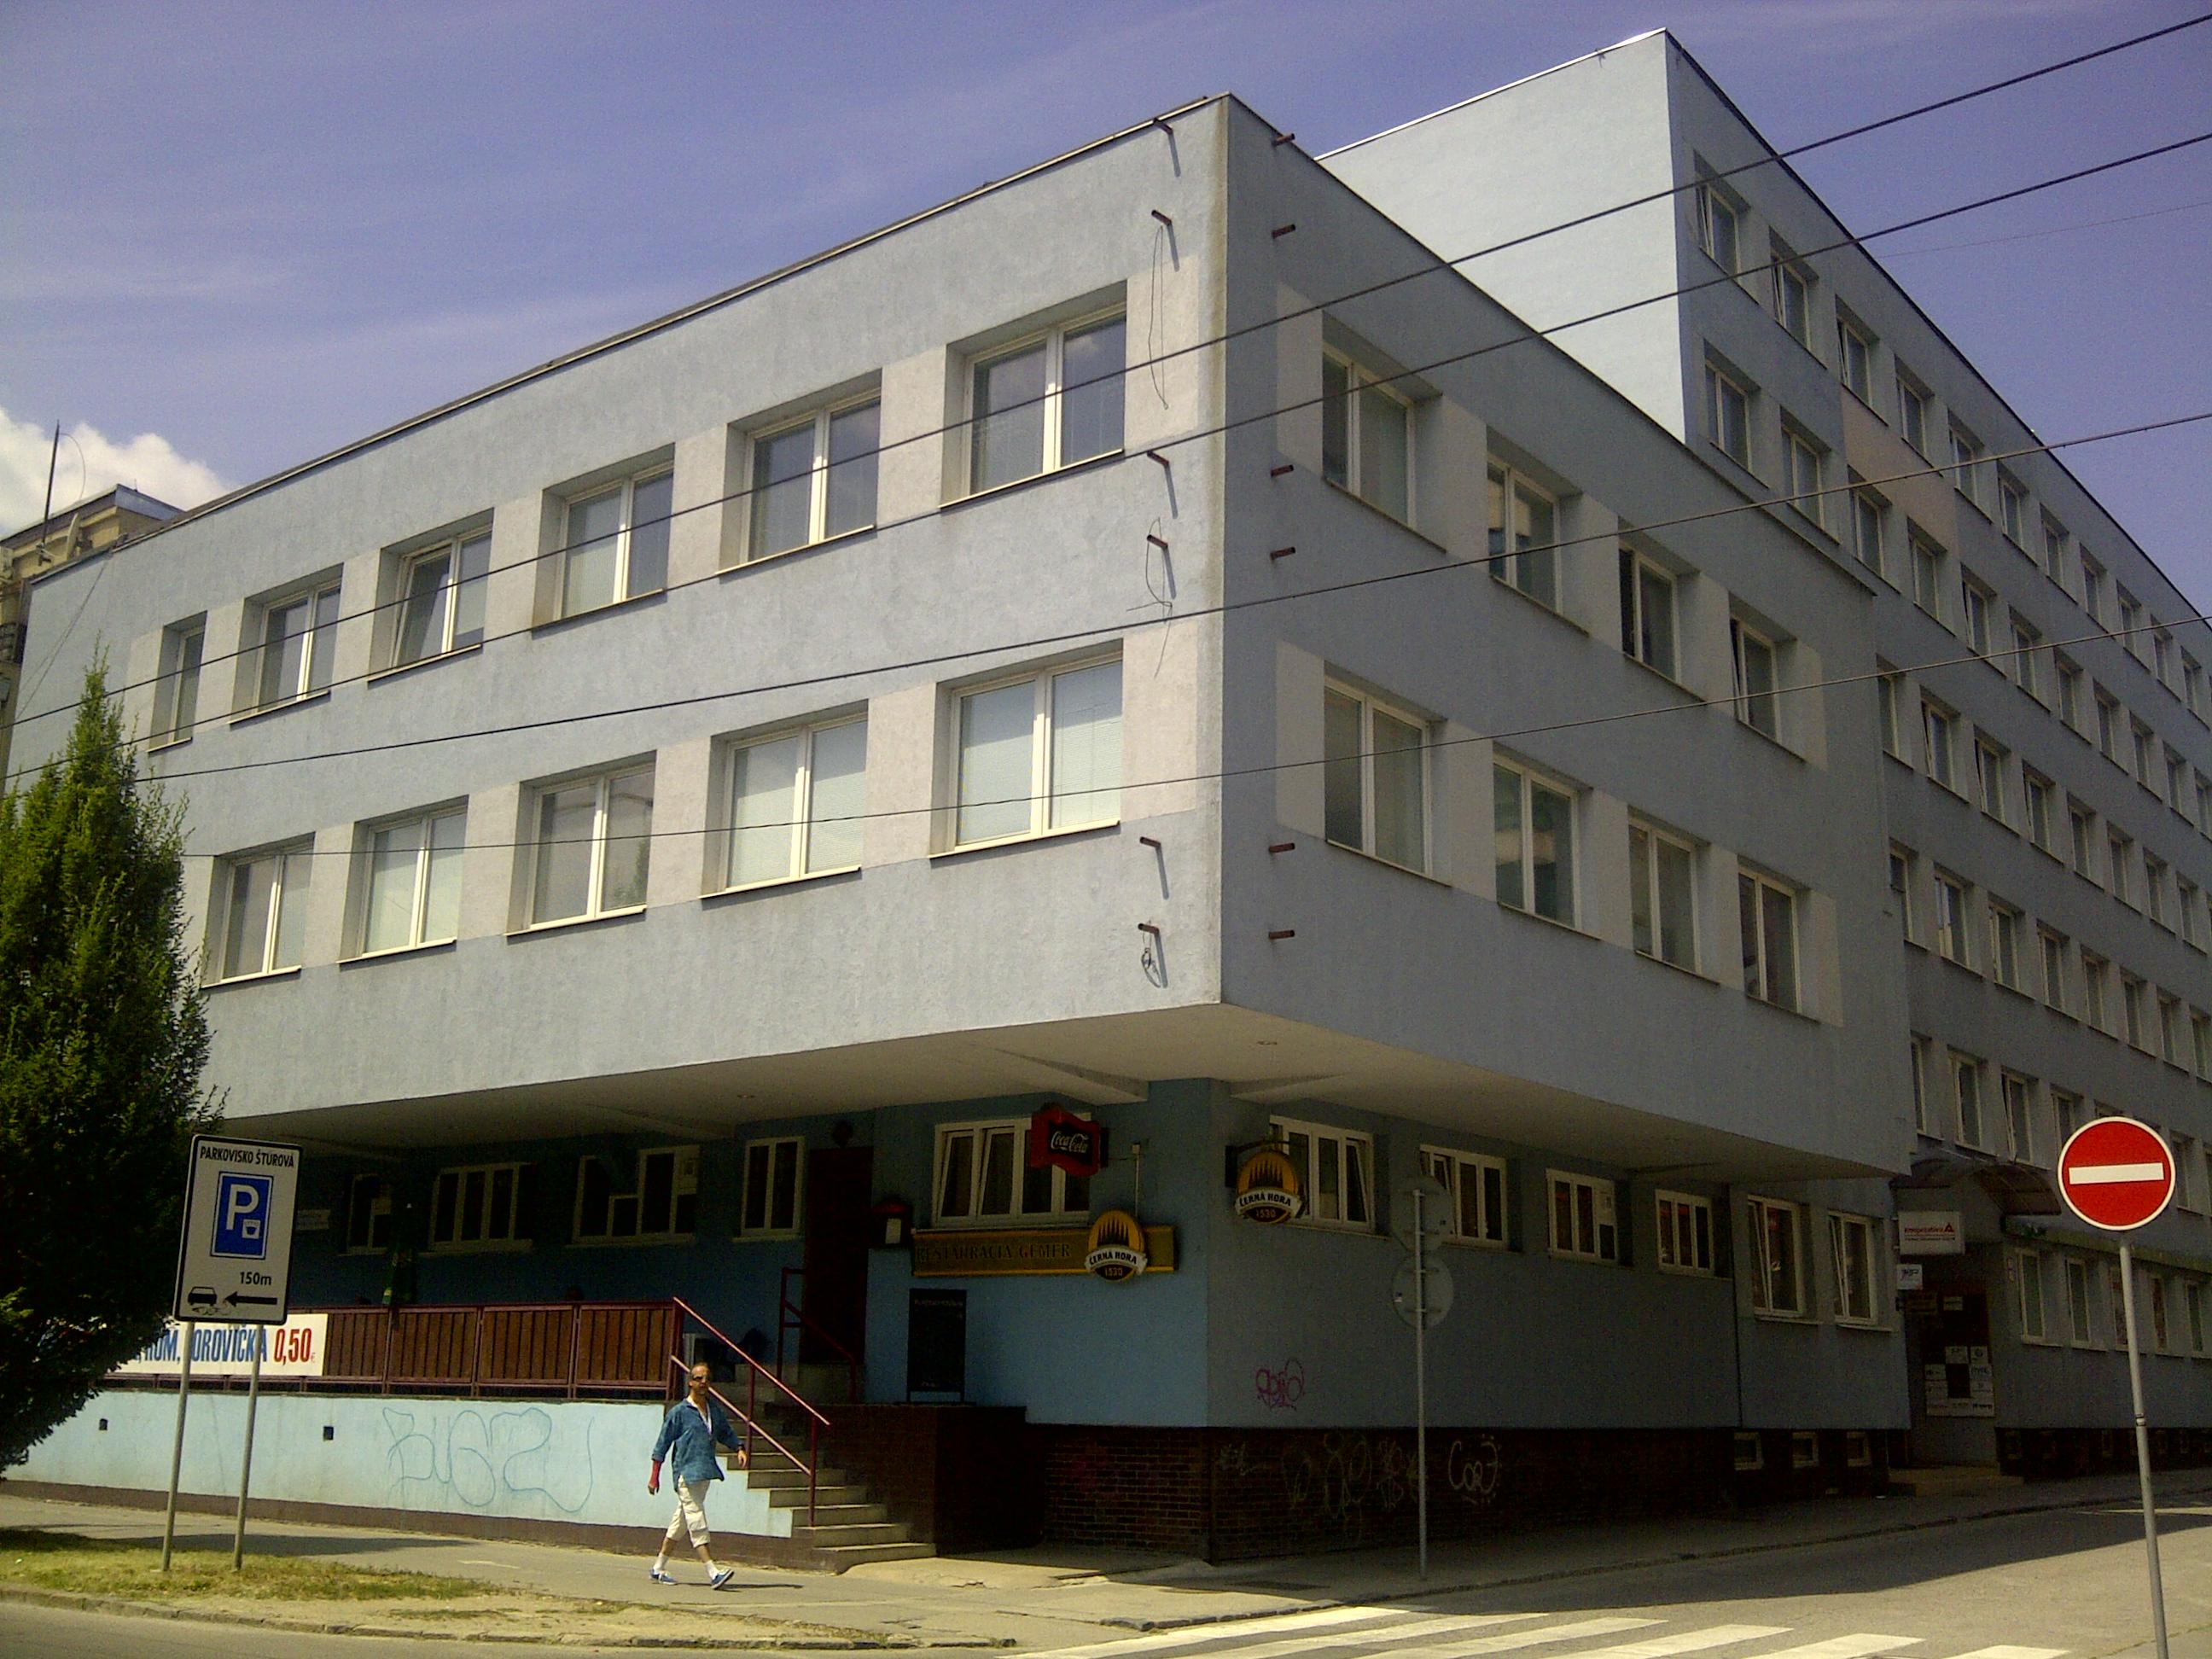 http://www.honors.sk/userfiles/image/Budova%20Sturova%202.jpg